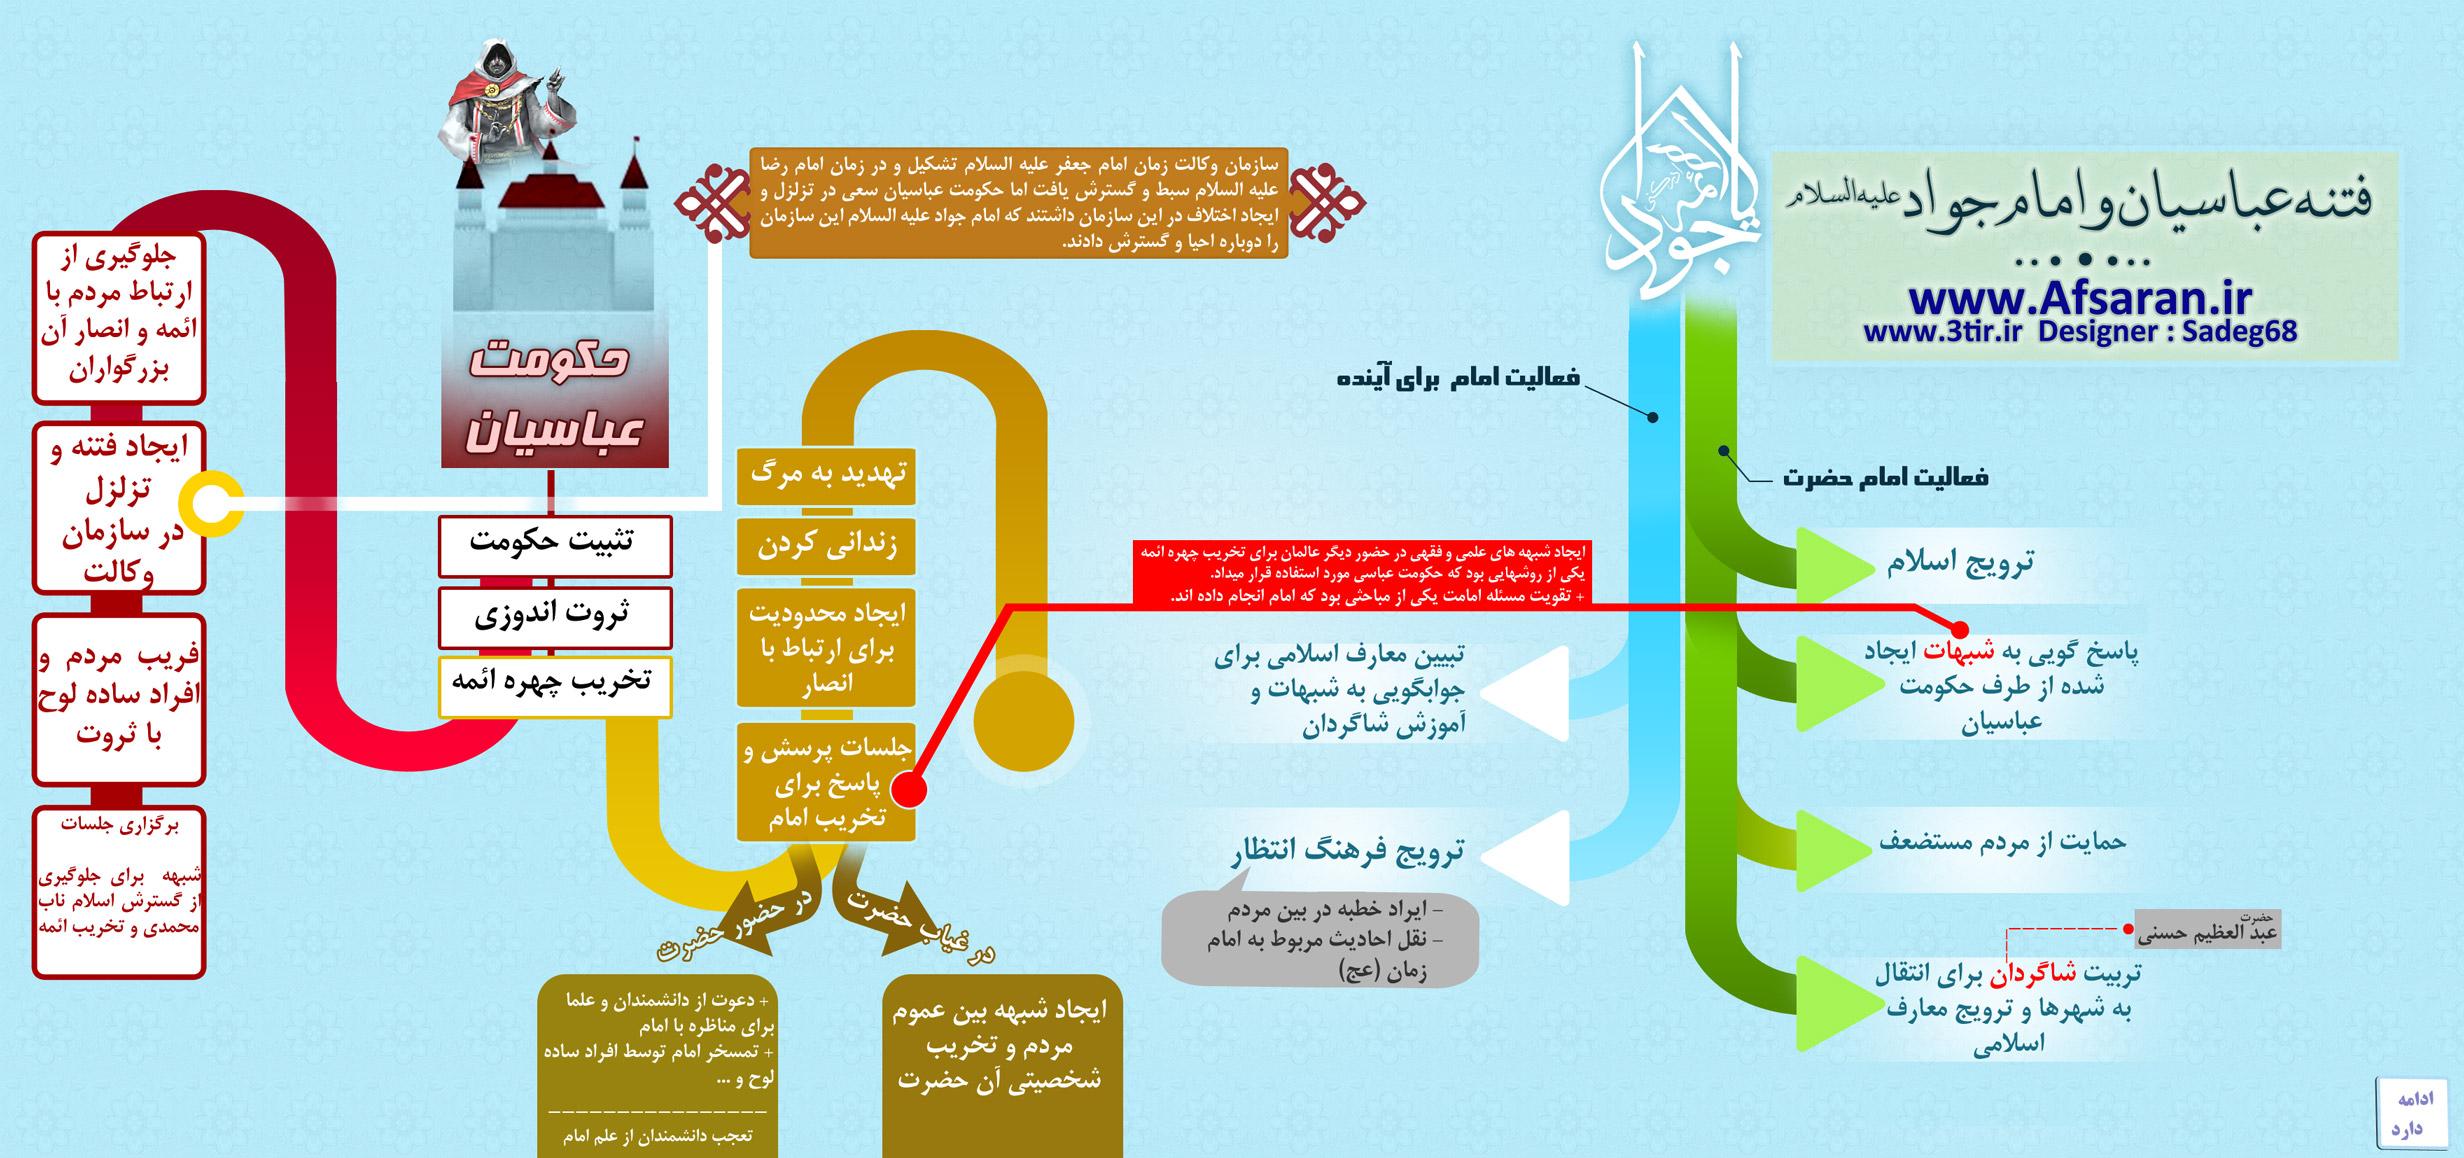 اینفوگرافیک - امام جواد (ع)